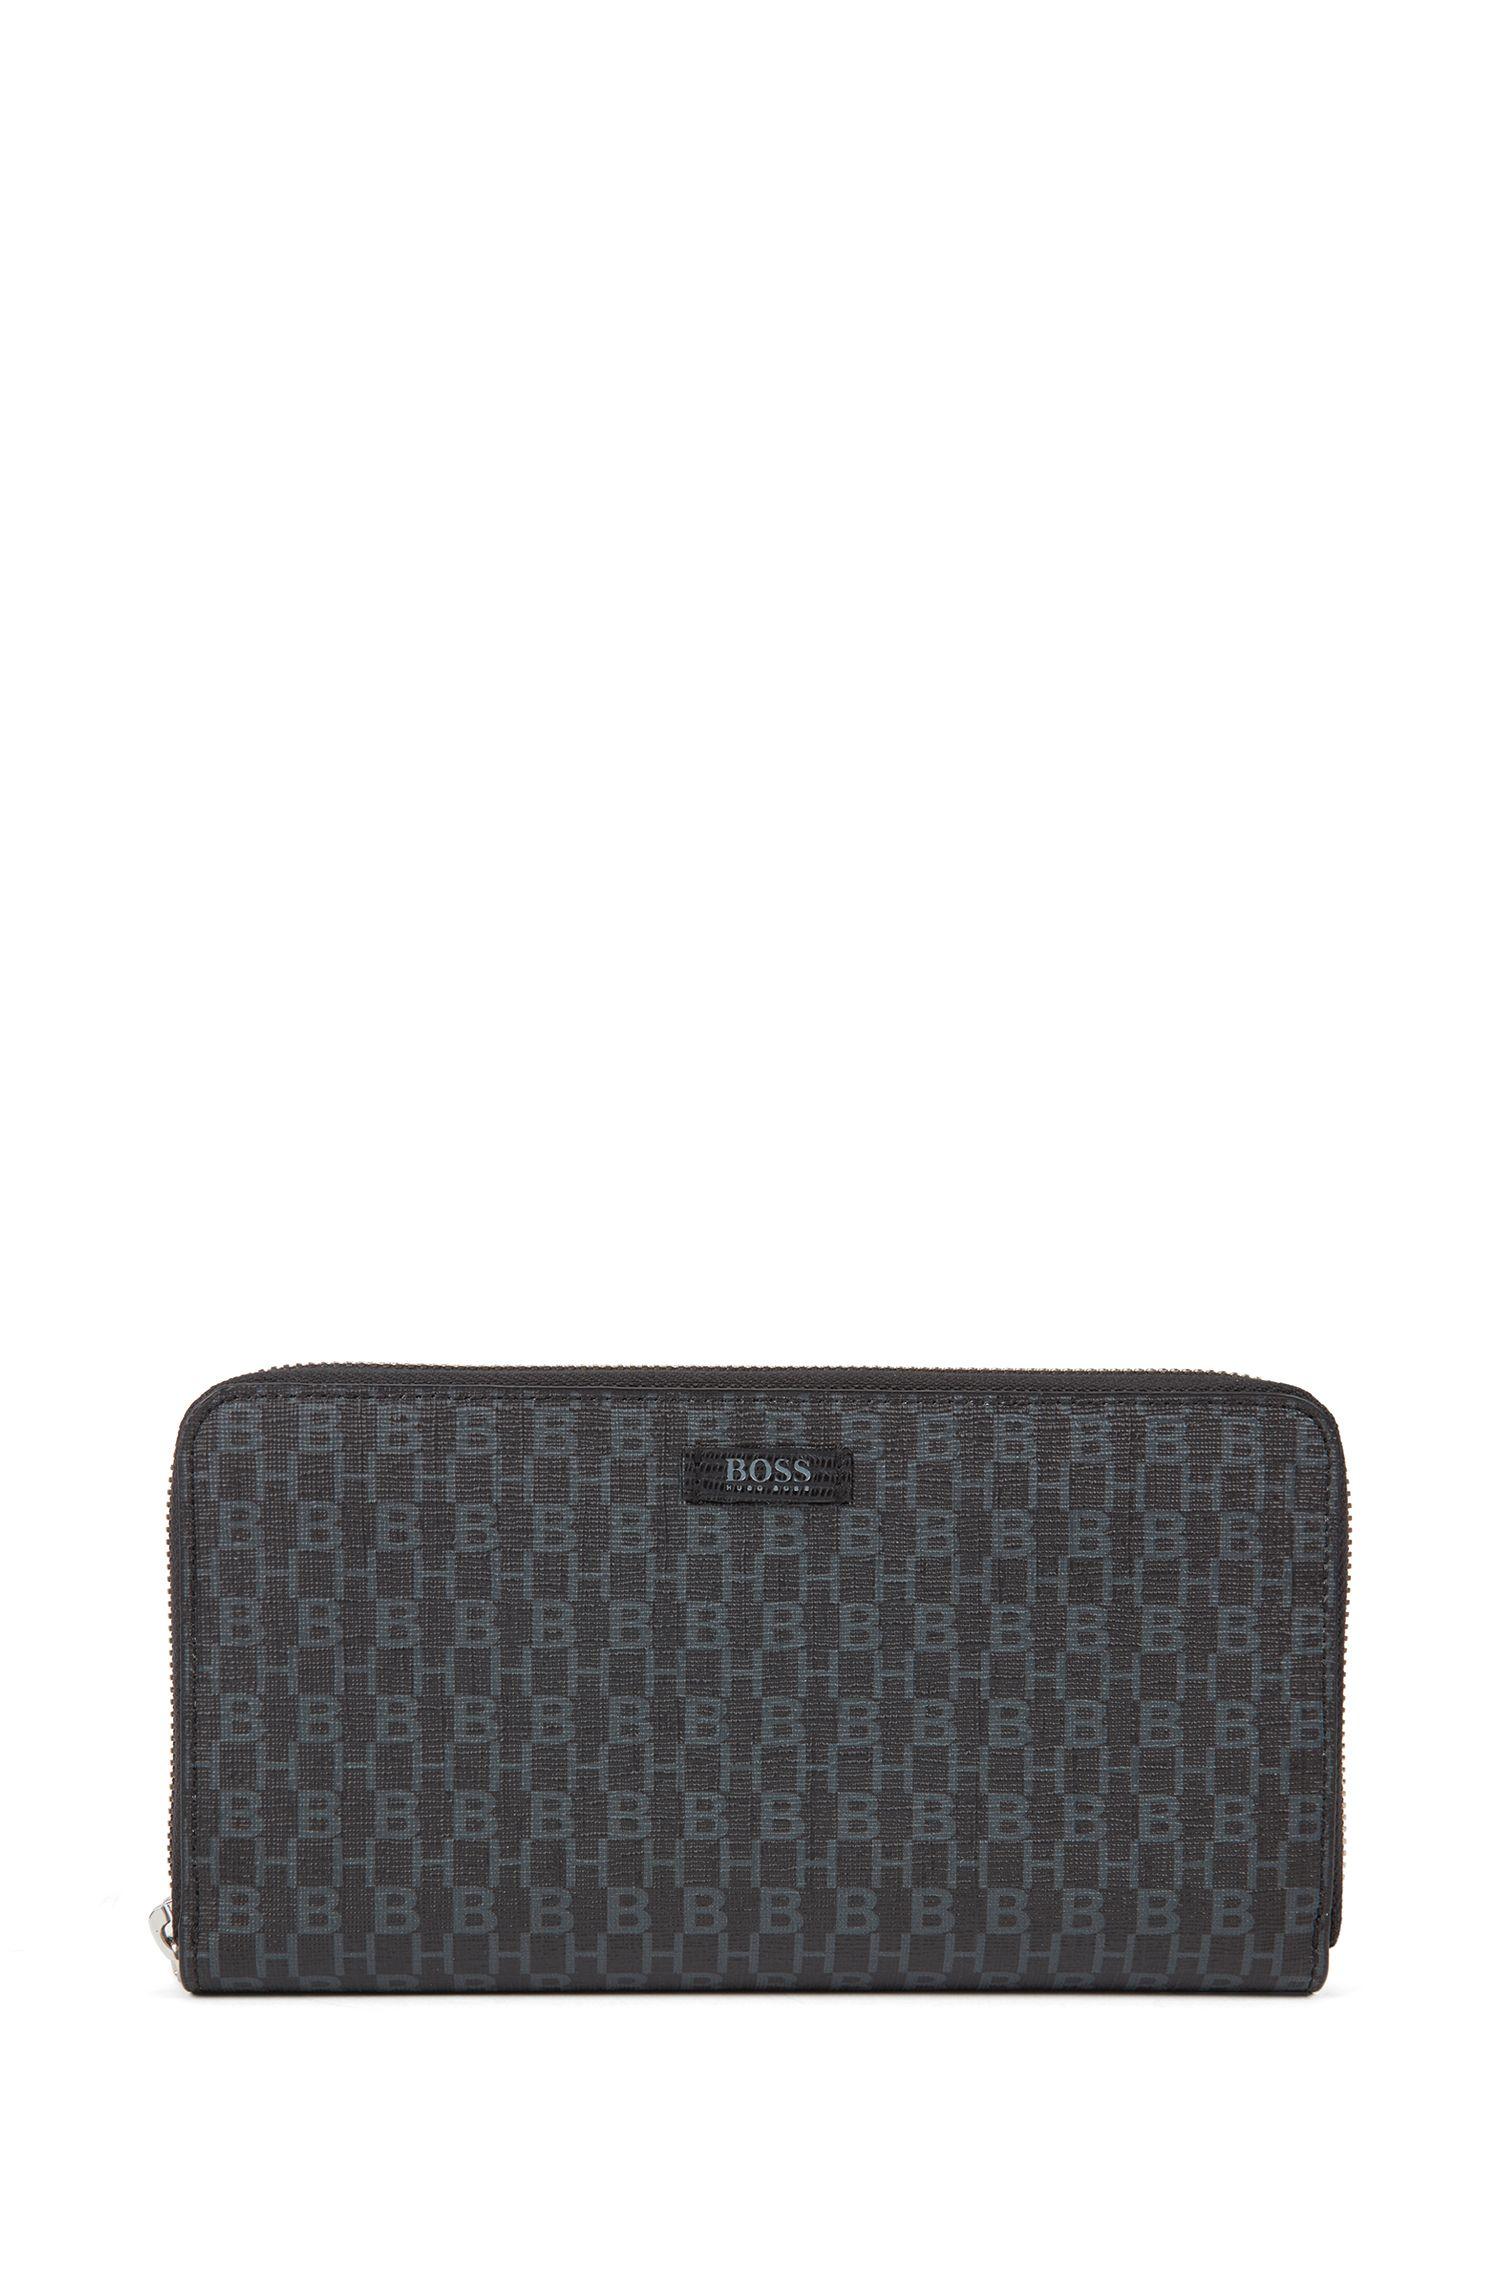 Ziparound wallet in Italian fabric with monogram print, Black